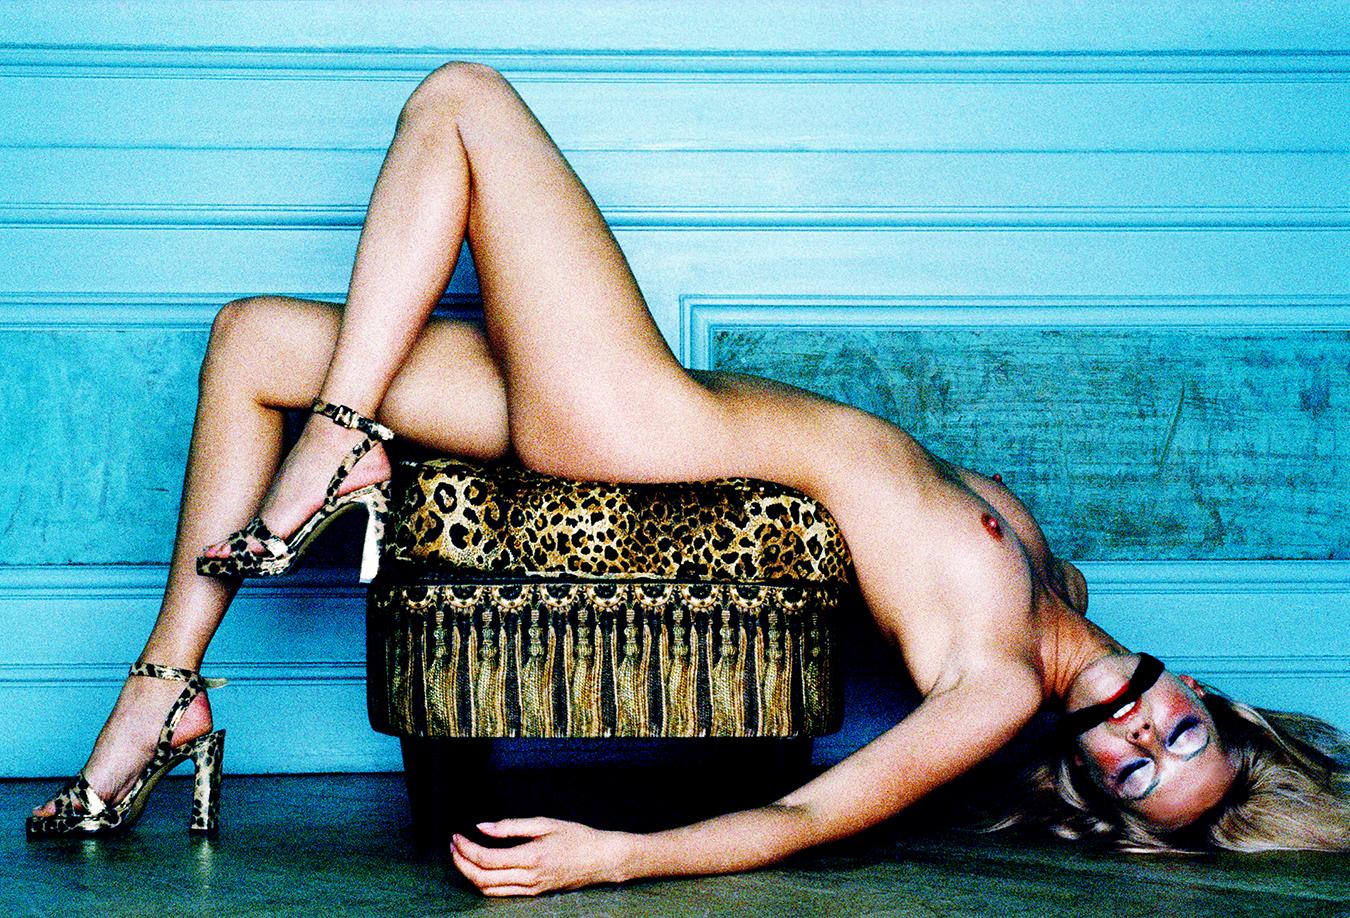 Tony_Ward_erotic_fashion_photography_model_Andrea_Suwa_nude_gagged_erotic_Max_magazine_Hamburgm Germany